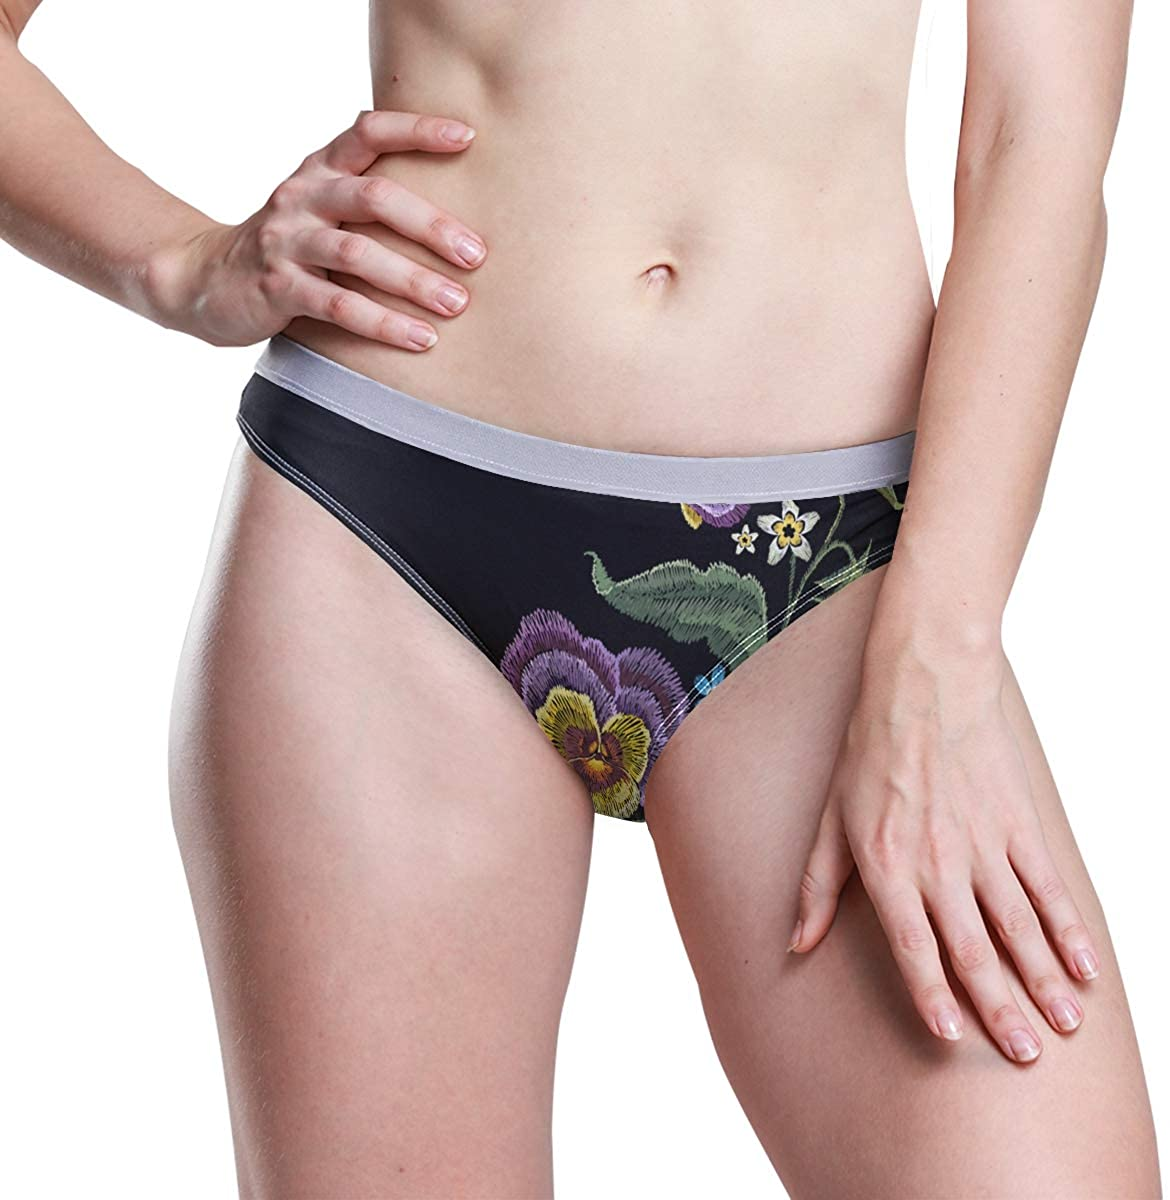 SLHFPX Flower Leaf Embroidery Women's Breathable Panties Seamless Comfort Underwear Bikini